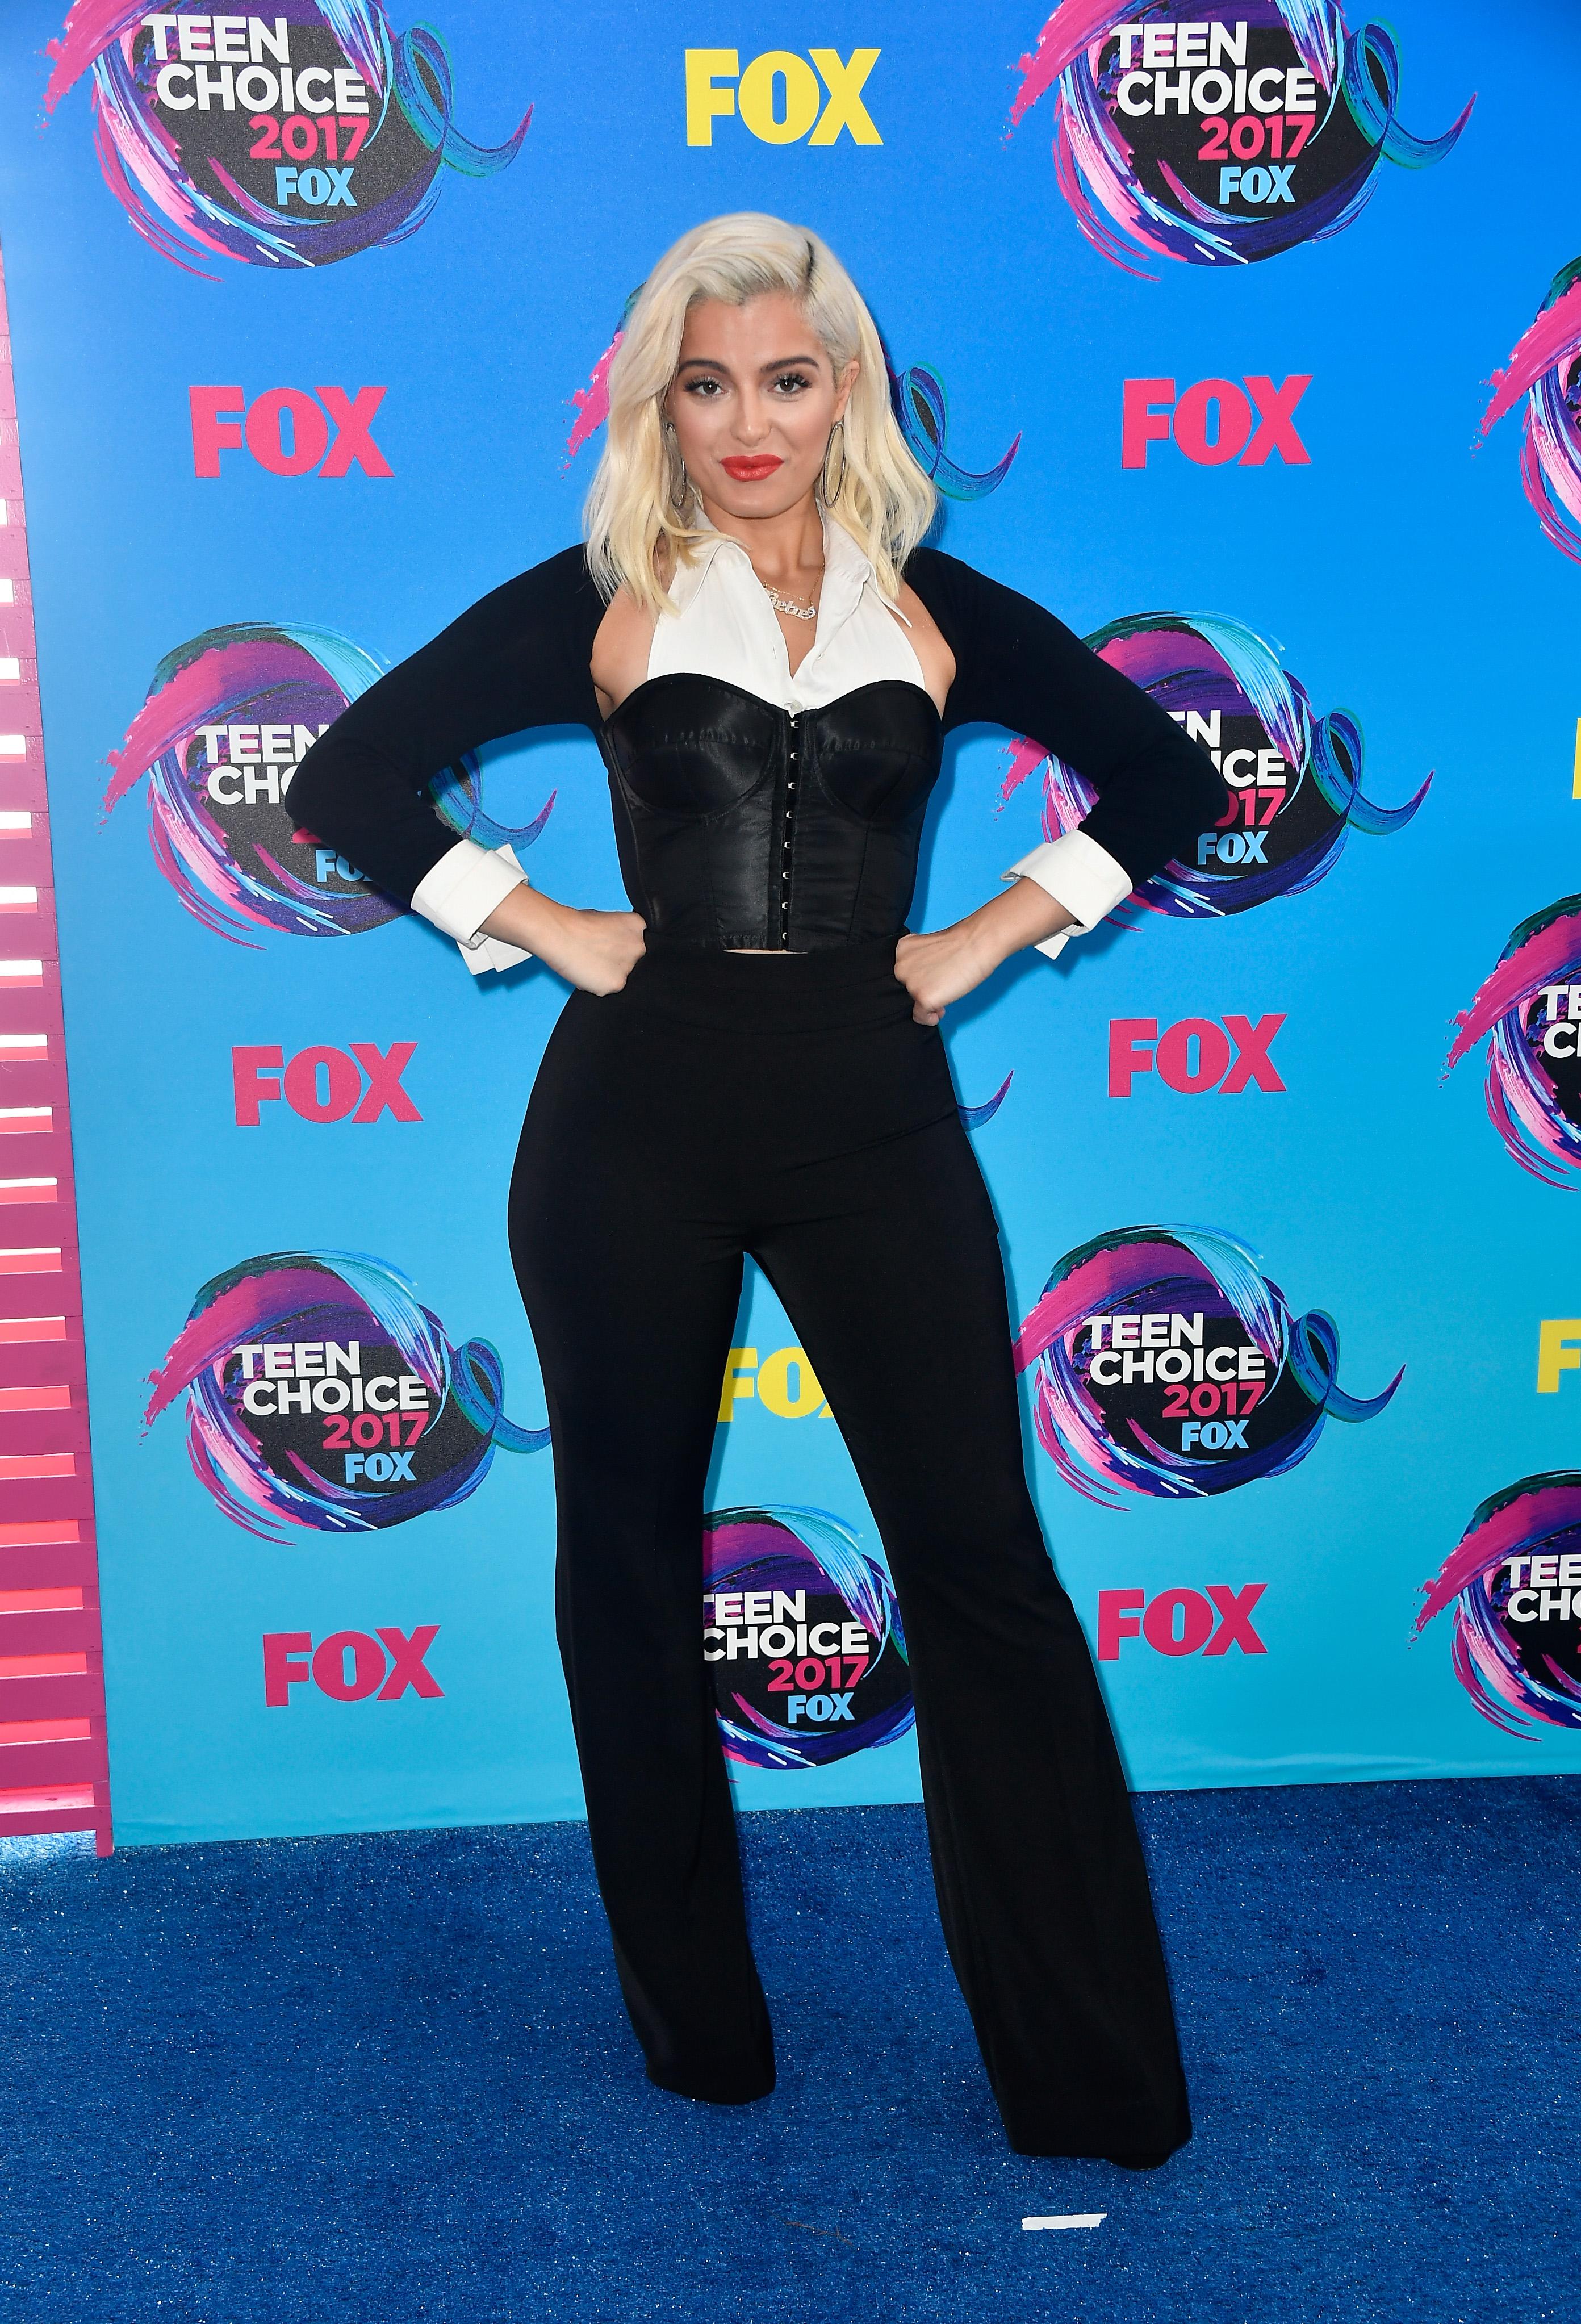 Teen Choice Awards 2017 - AUGUST 13: Singer Bebe Rexha